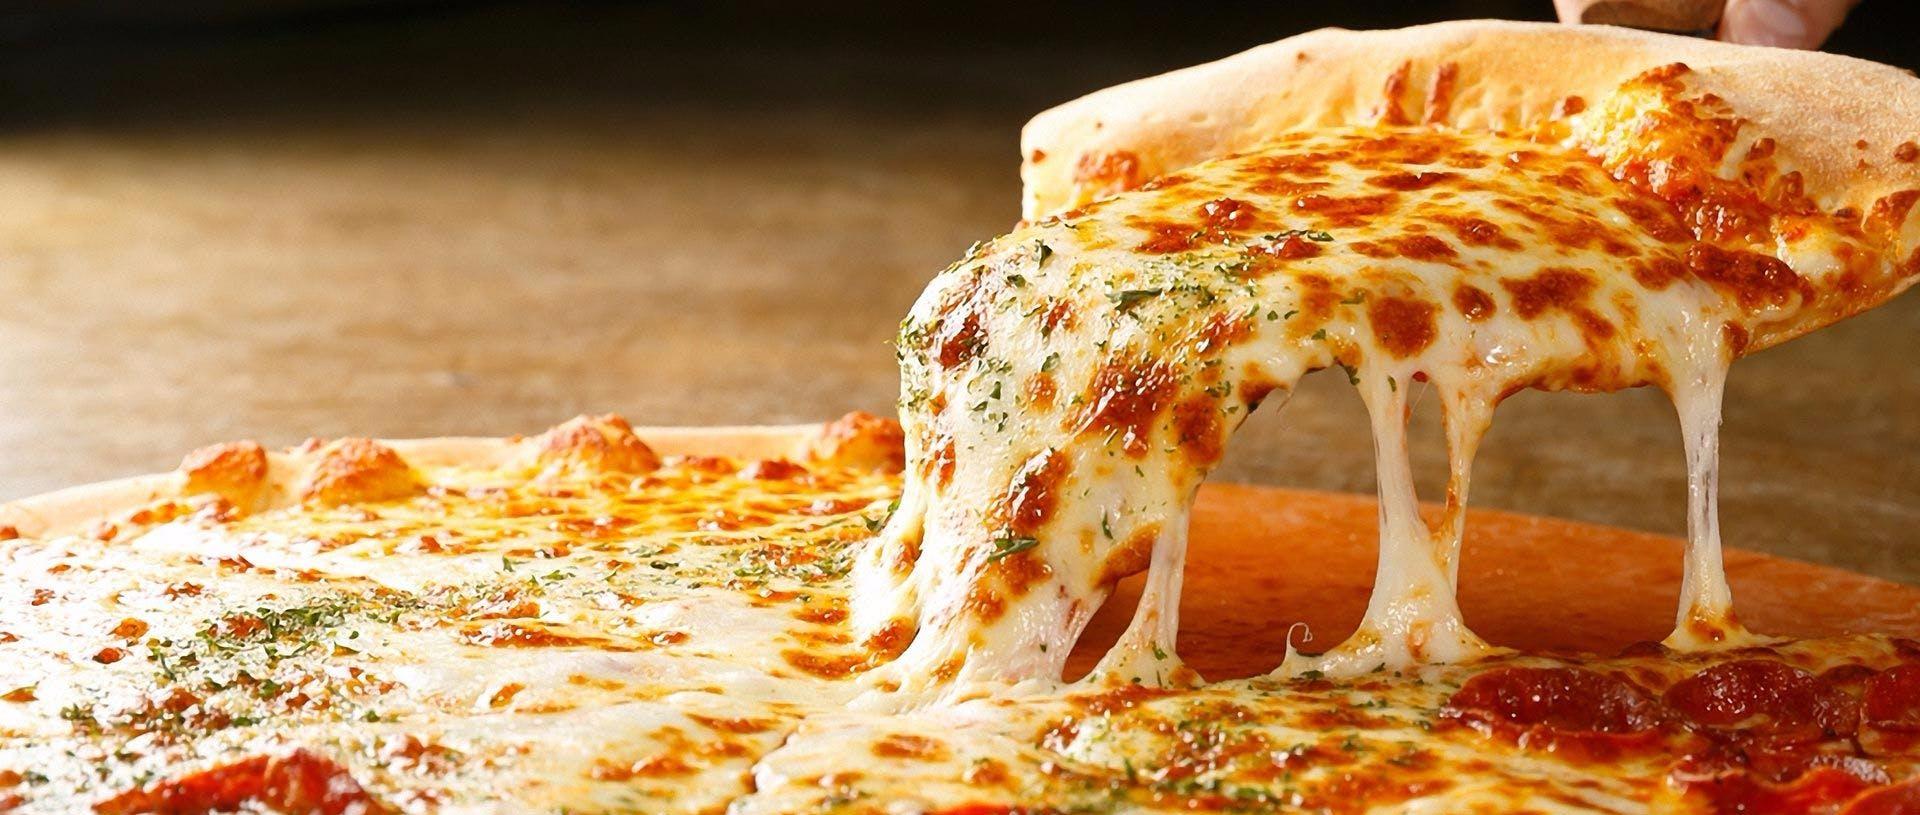 Pronto Pizzeria Burnley Pizza Takeaway In Burnley